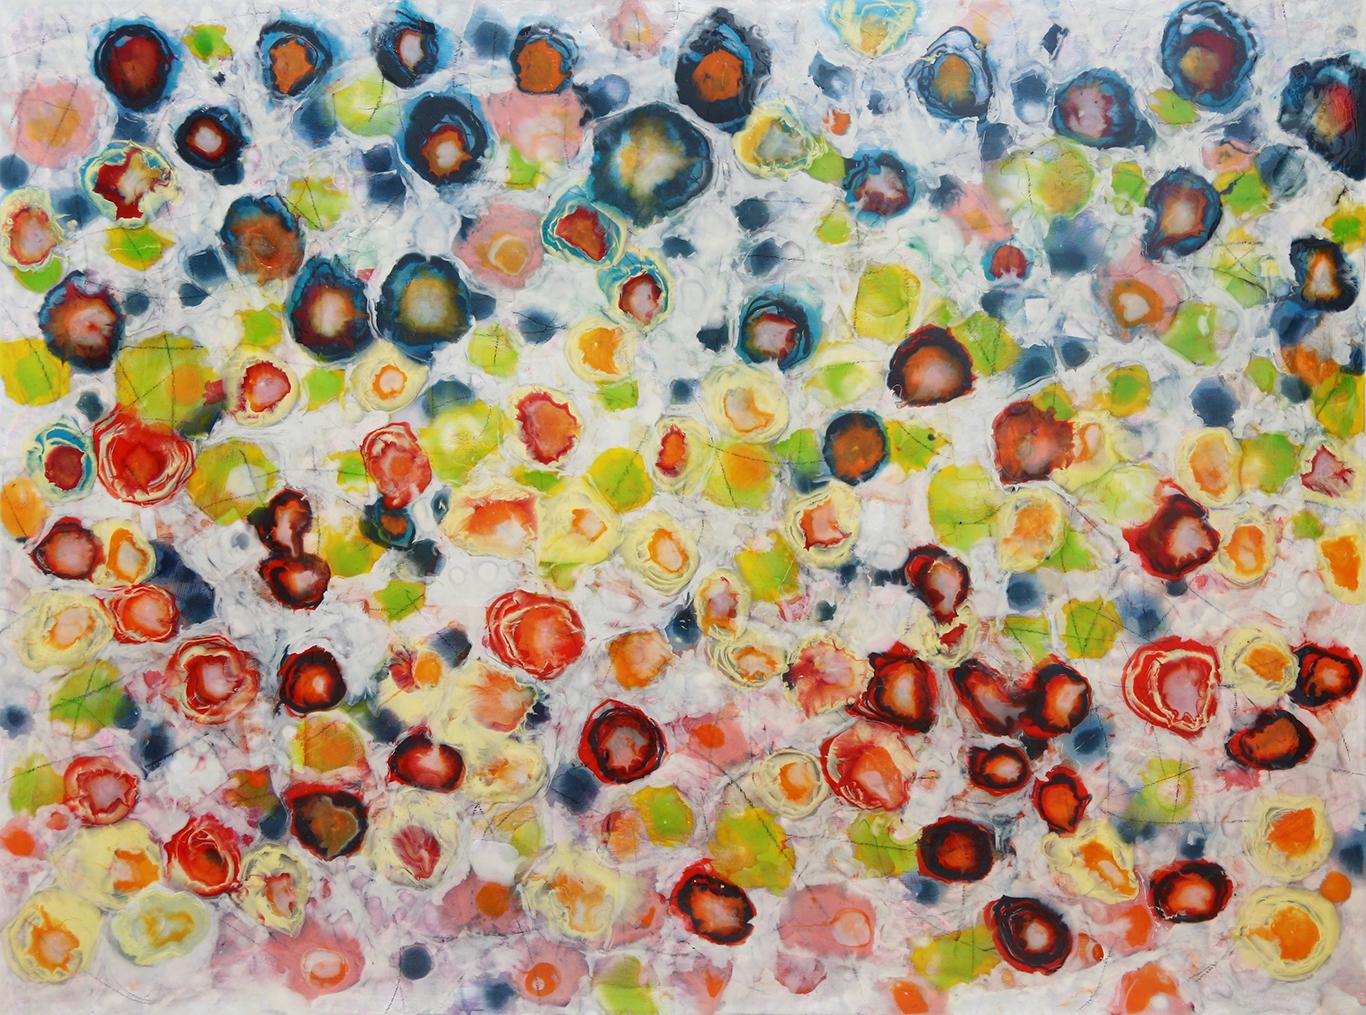 New Variations by Farida Hughes